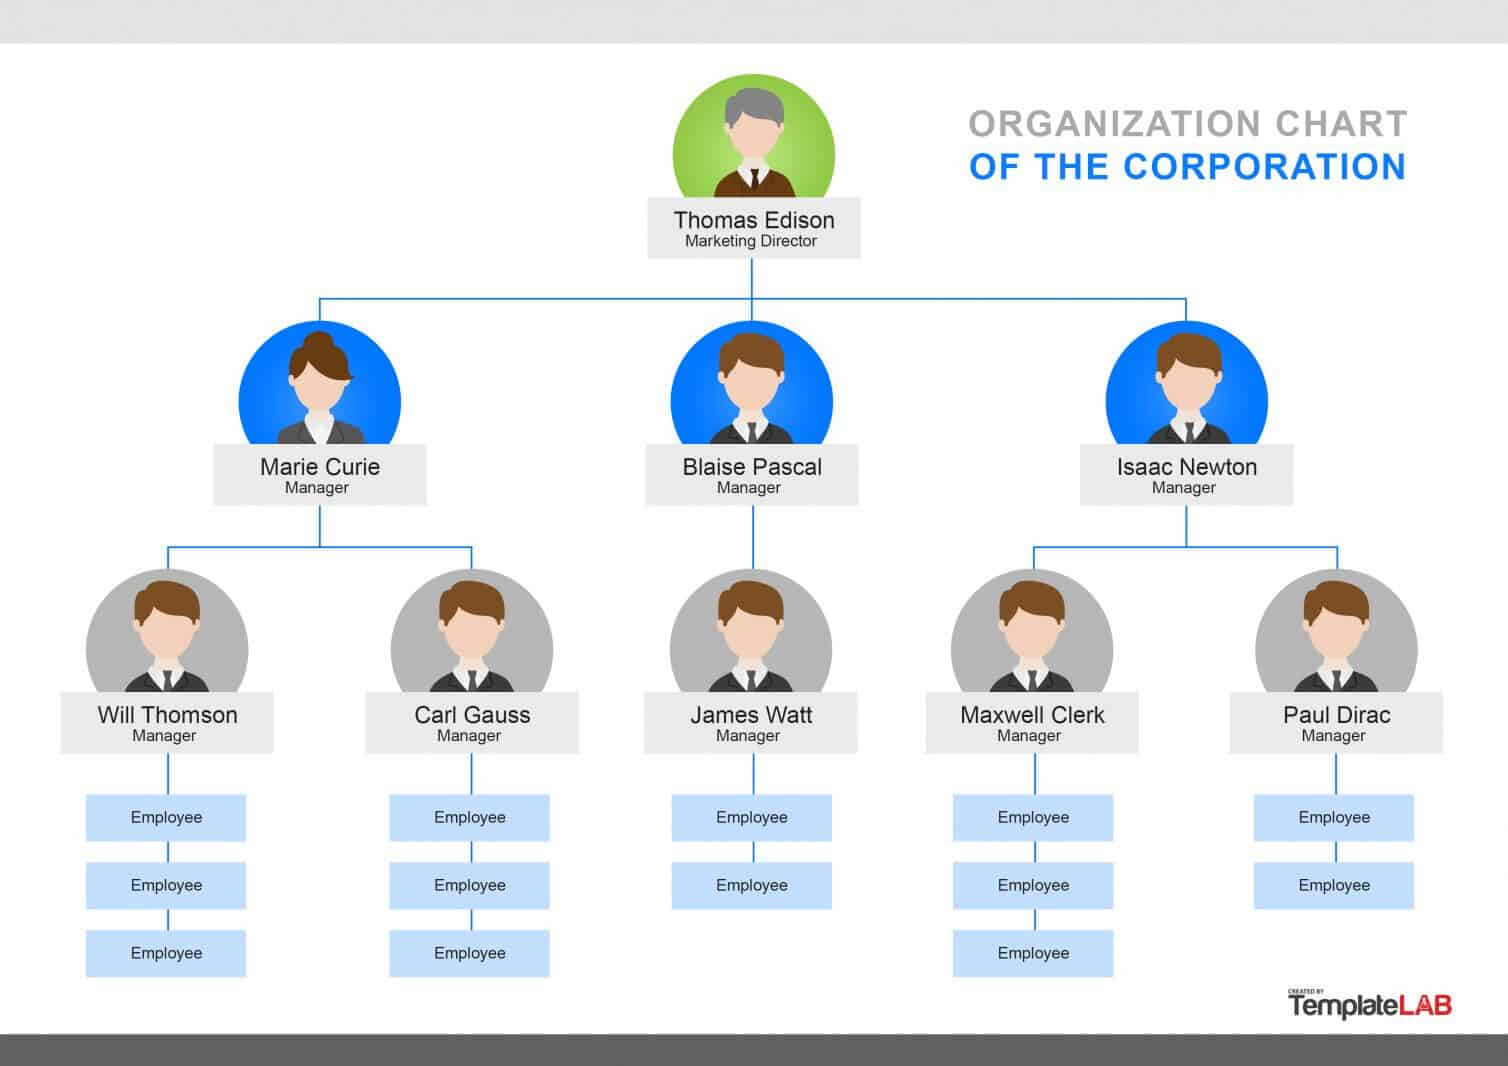 40 Organizational Chart Templates (Word, Excel, Powerpoint) regarding Microsoft Powerpoint Org Chart Template